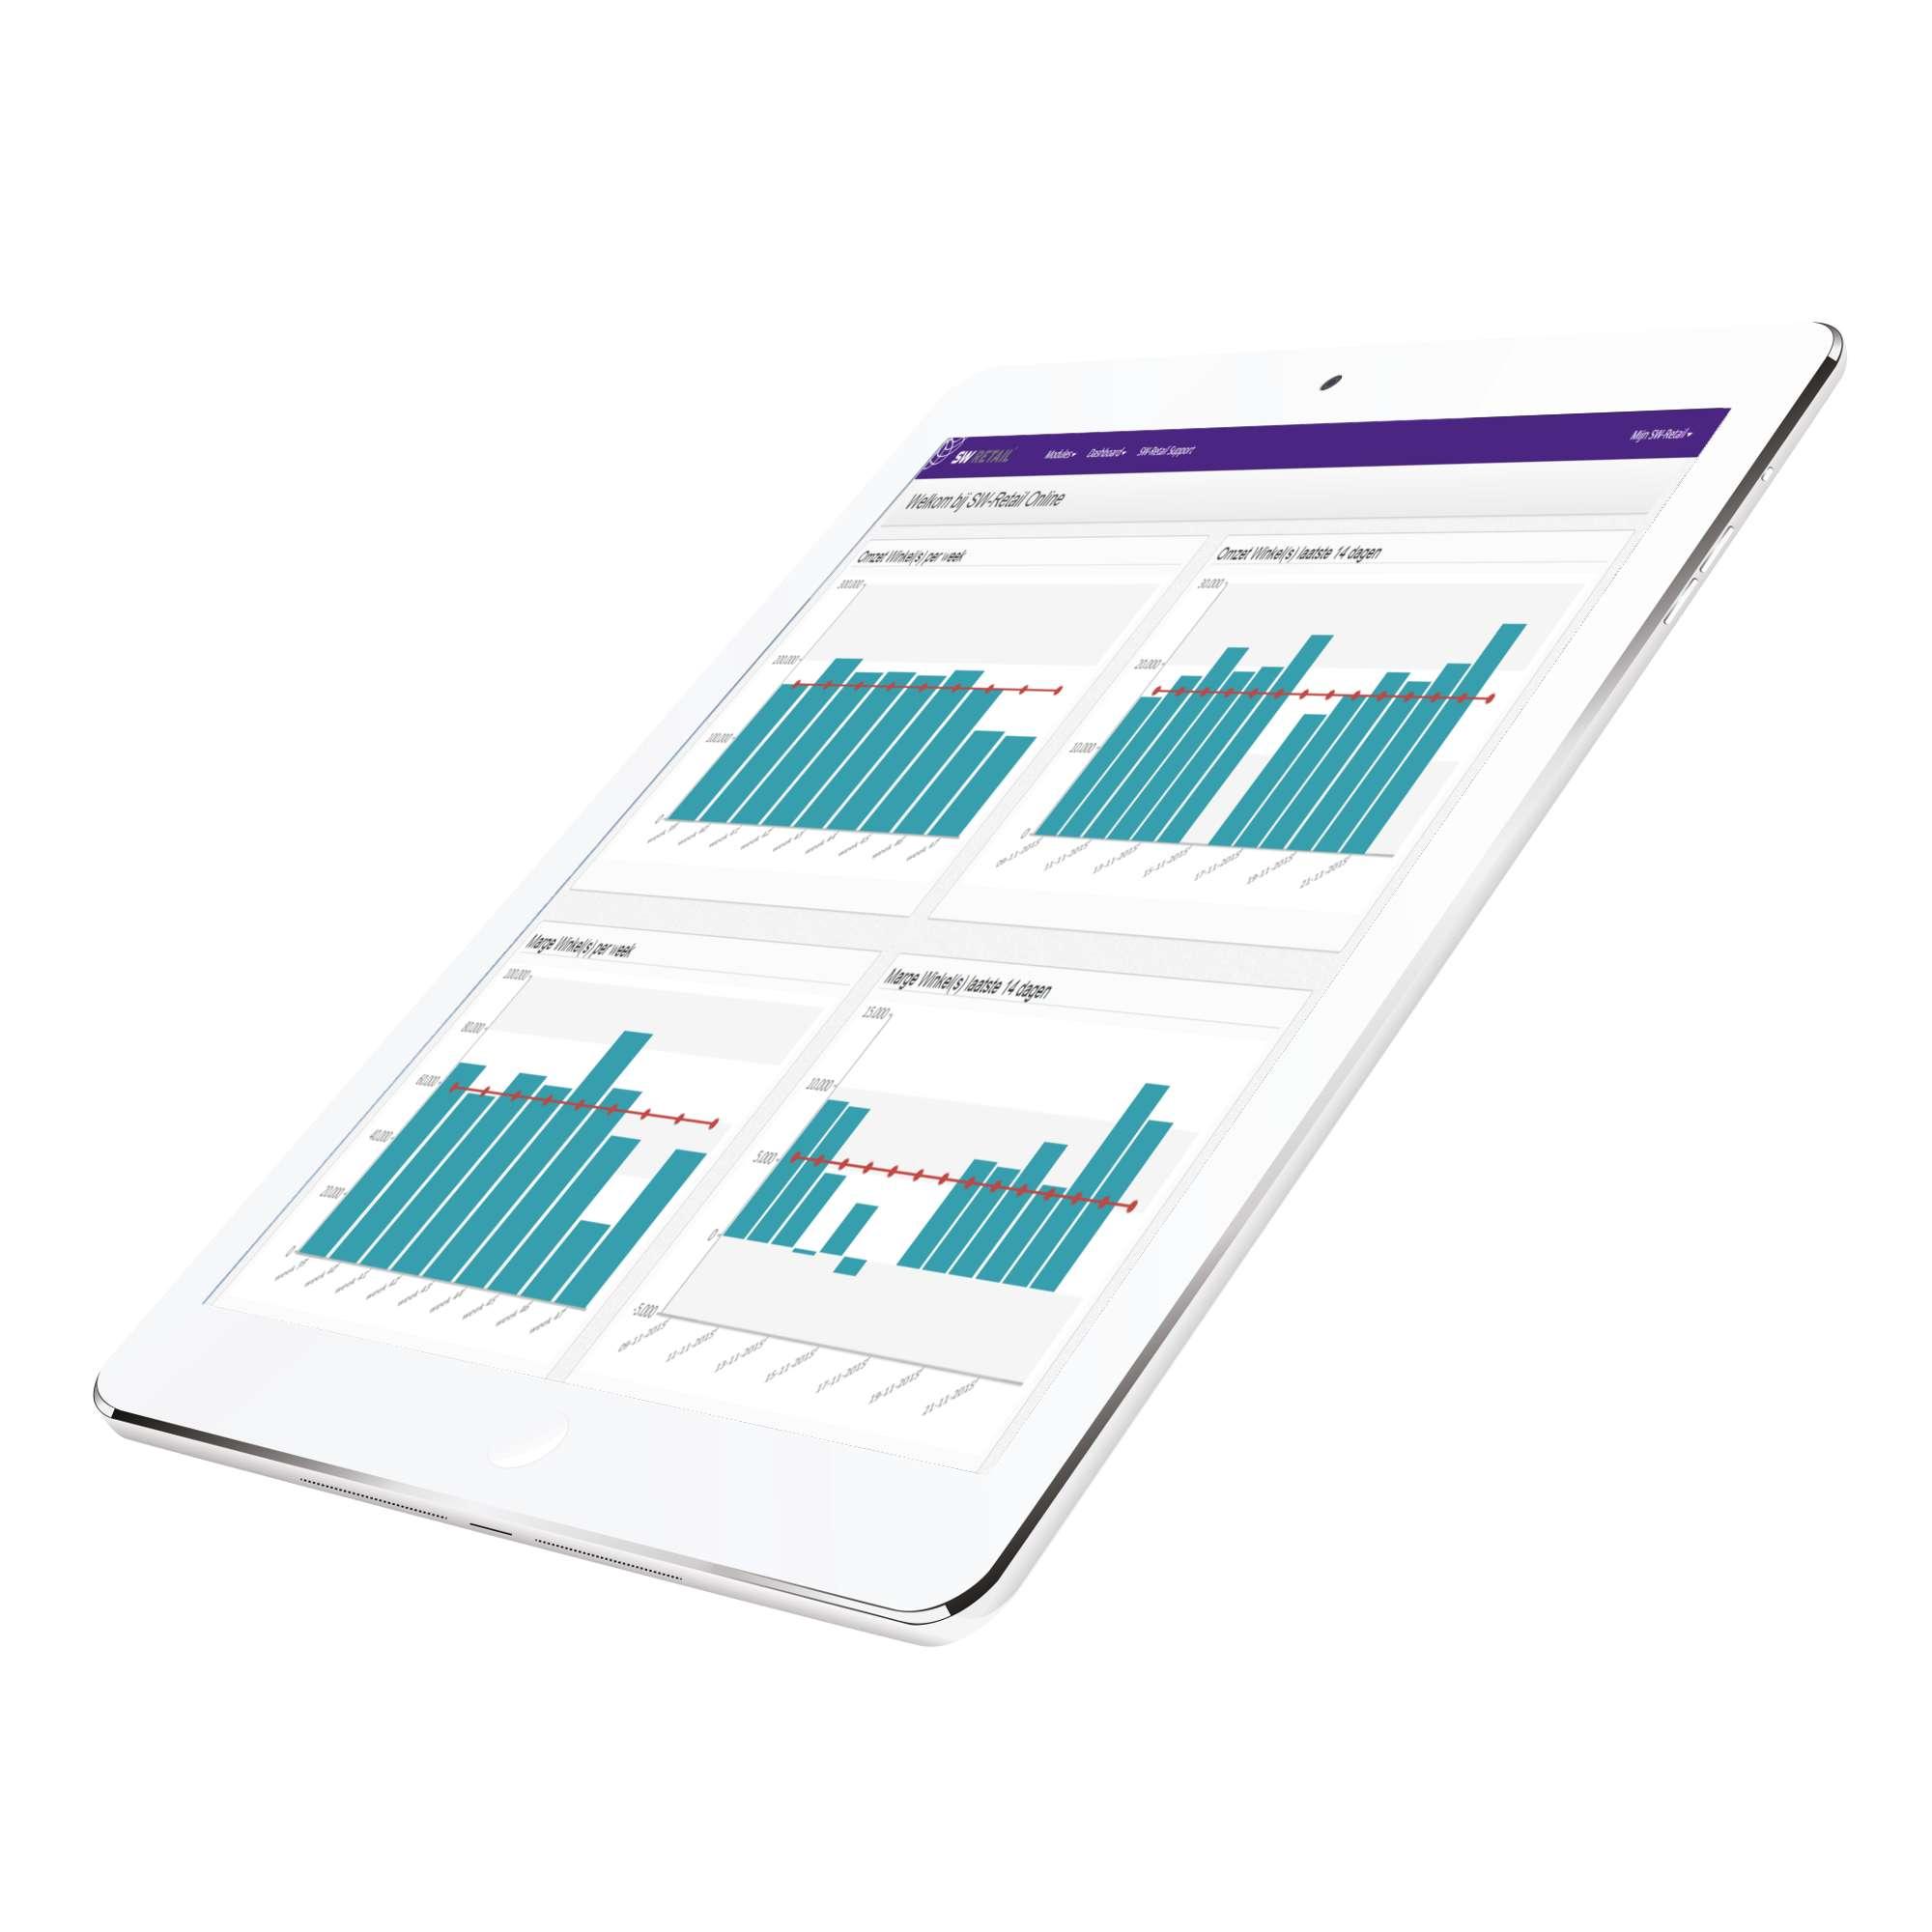 SW-Retail dashboard op iPad